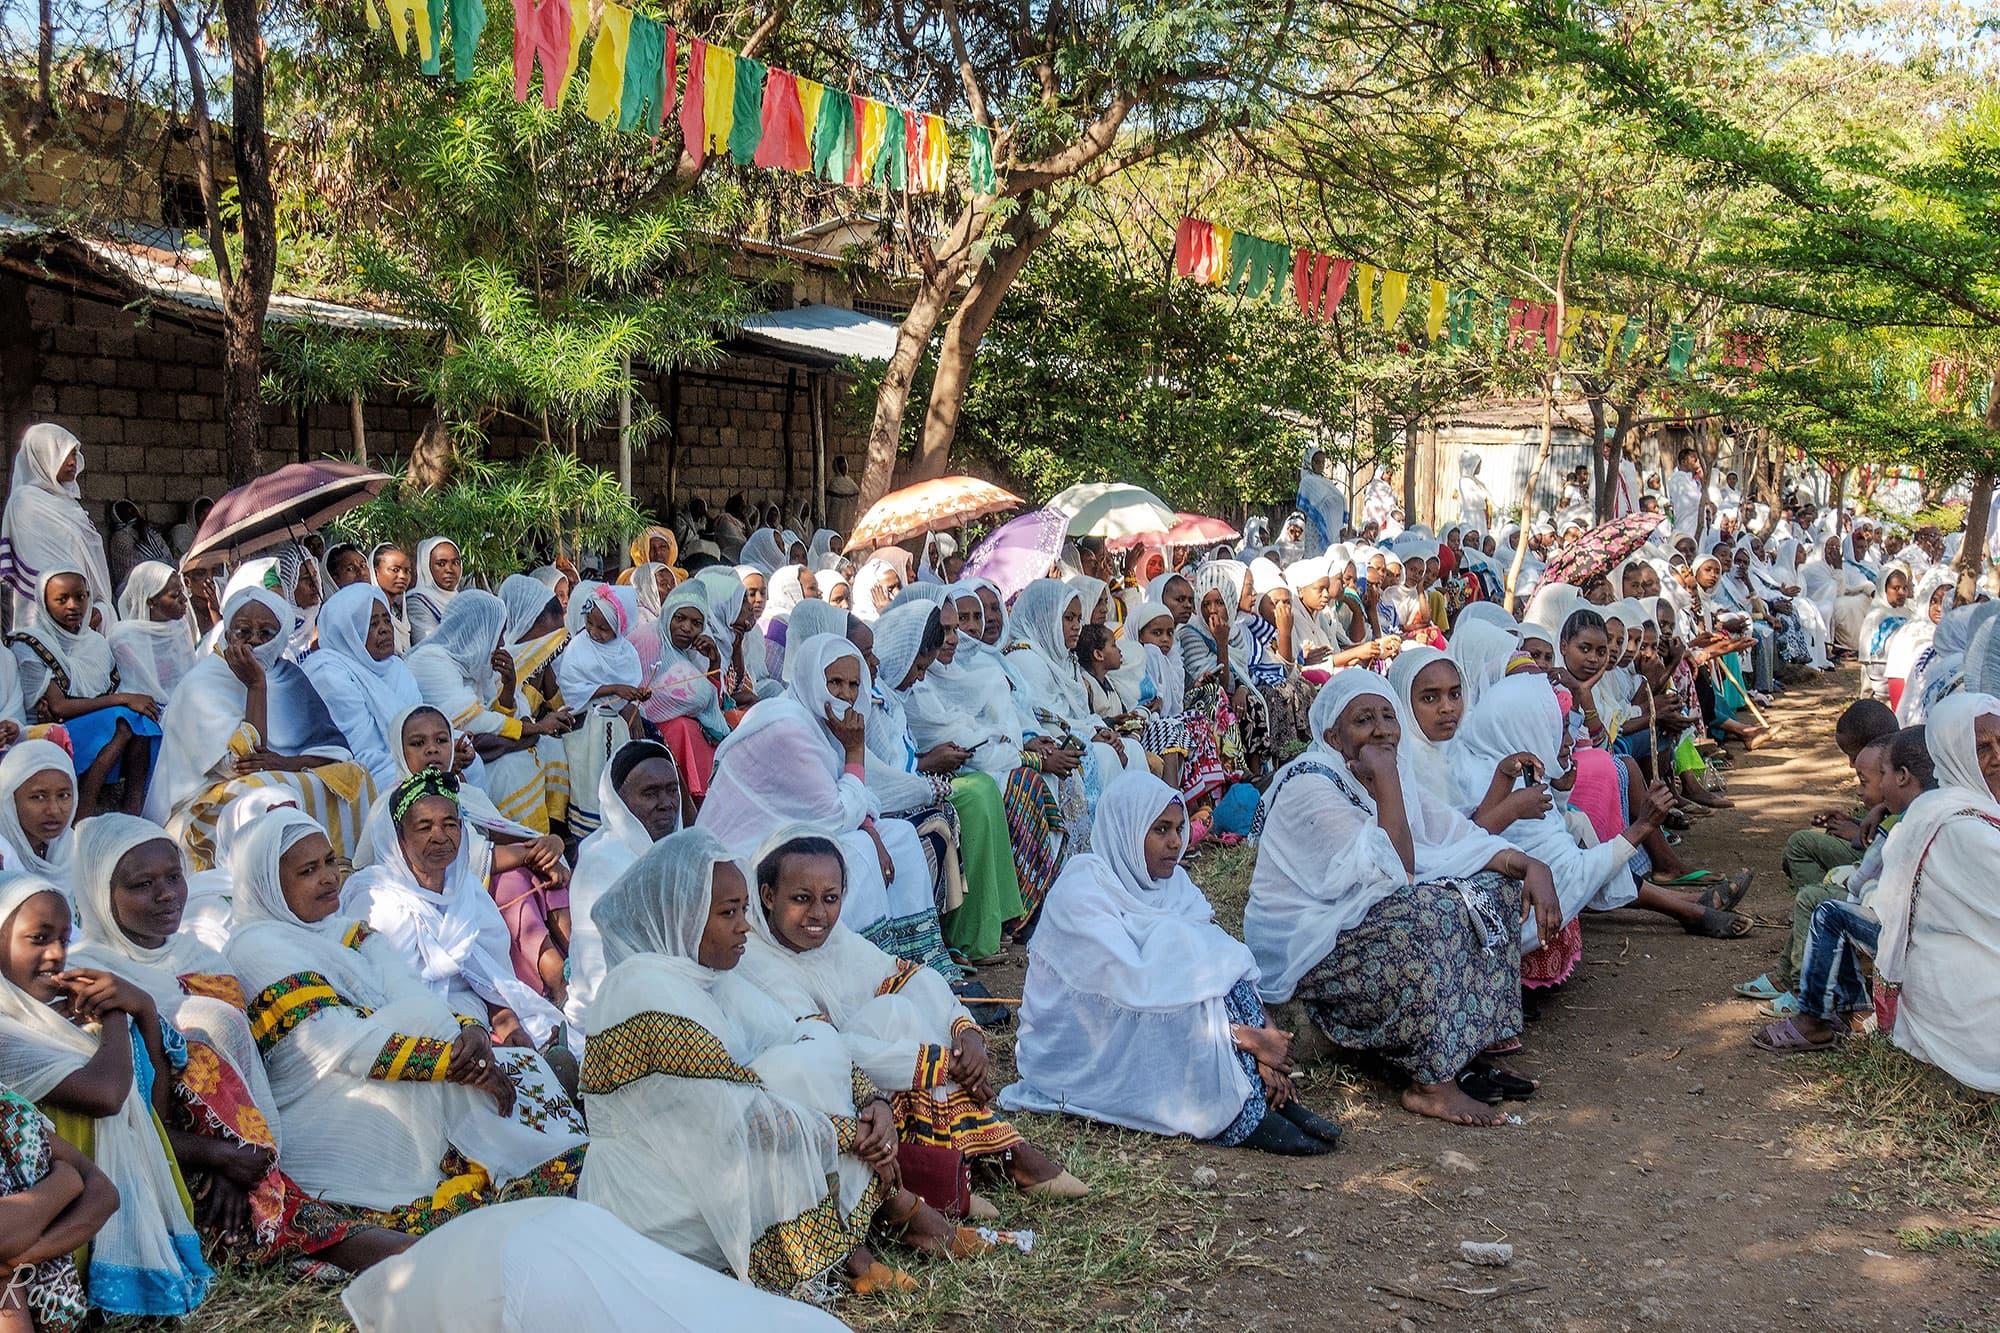 Norte de Etiopía - Etiopía- imagen #9